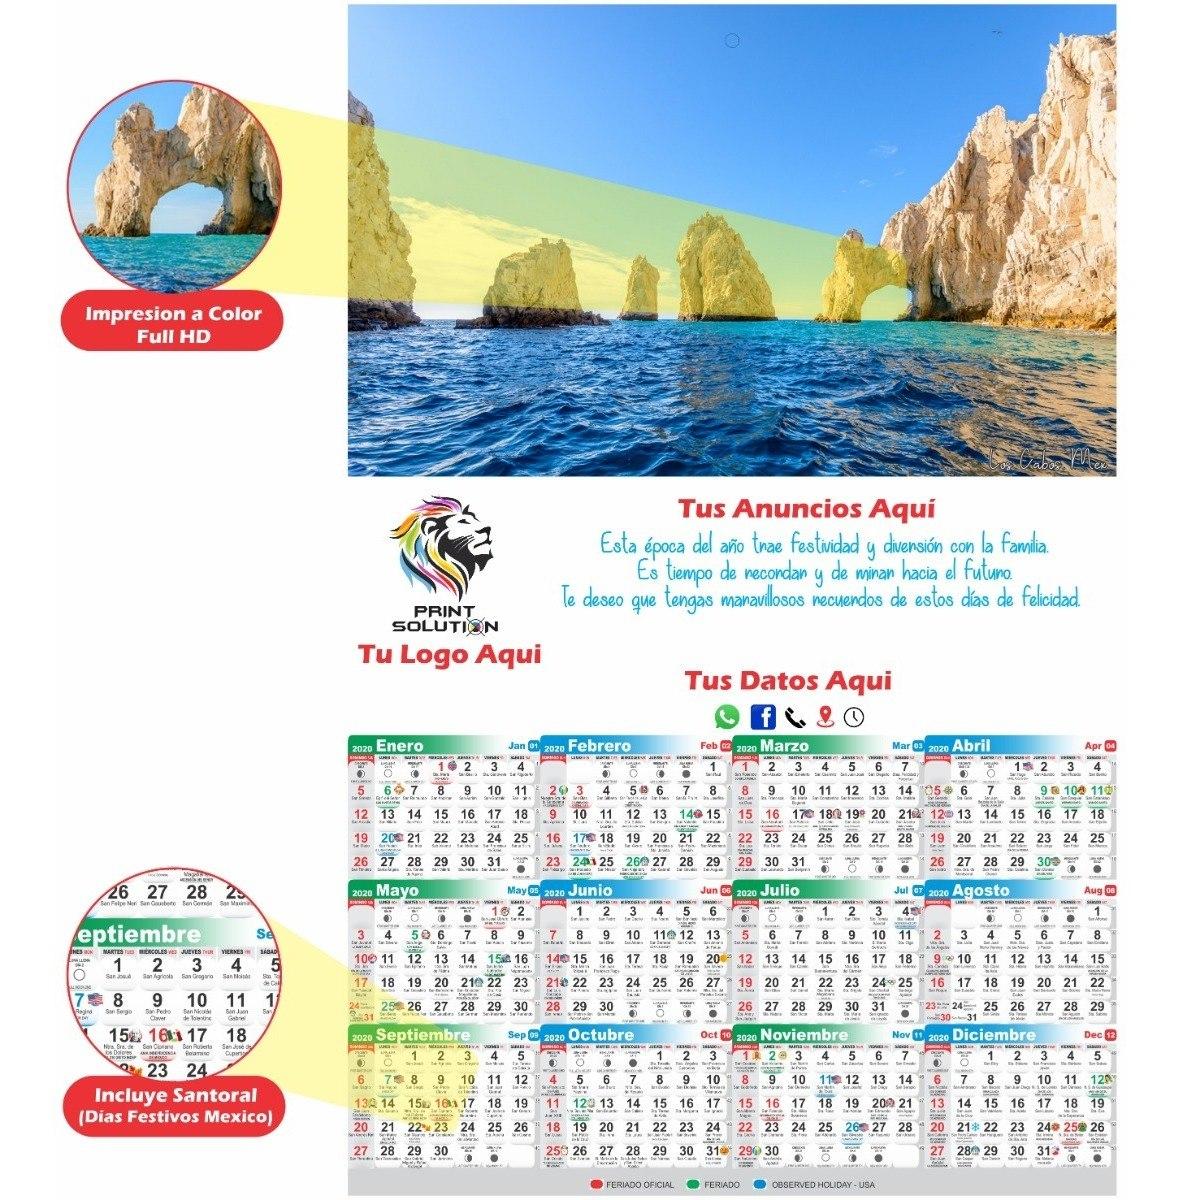 Calendario Agosto 2020 Para Imprimir Gratis.100 Calendarios 2020 C Santoral 43cm X 27cm Envio Gratis Personalizados